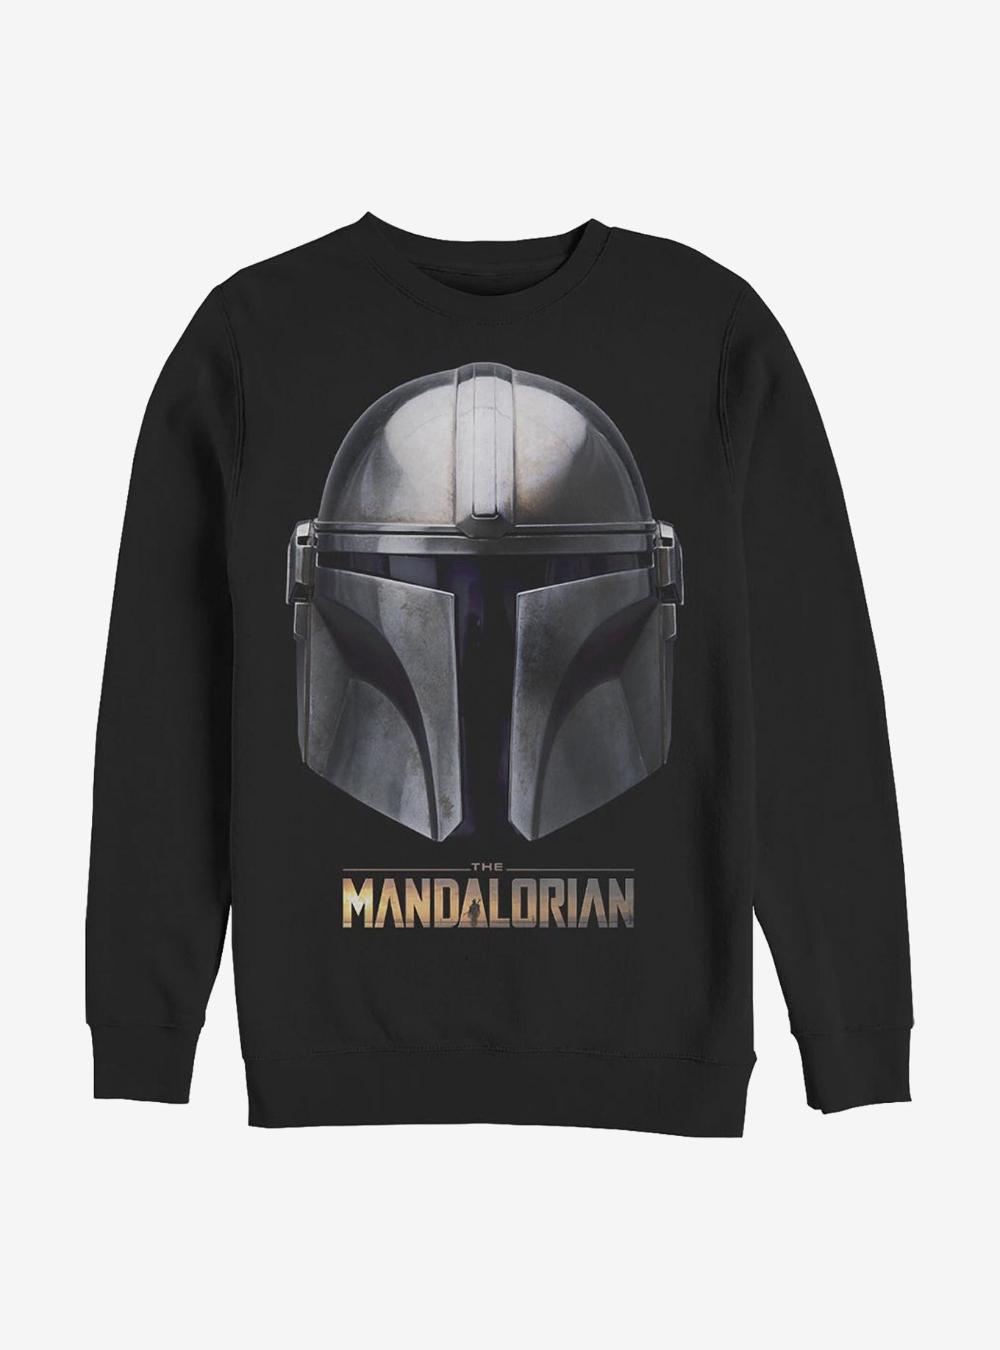 Star Wars The Mandalorian Mandalorian Helmet Crew Sweatshirt Crew Sweatshirts Mandalorian Helmet Sweatshirts [ 1350 x 1000 Pixel ]